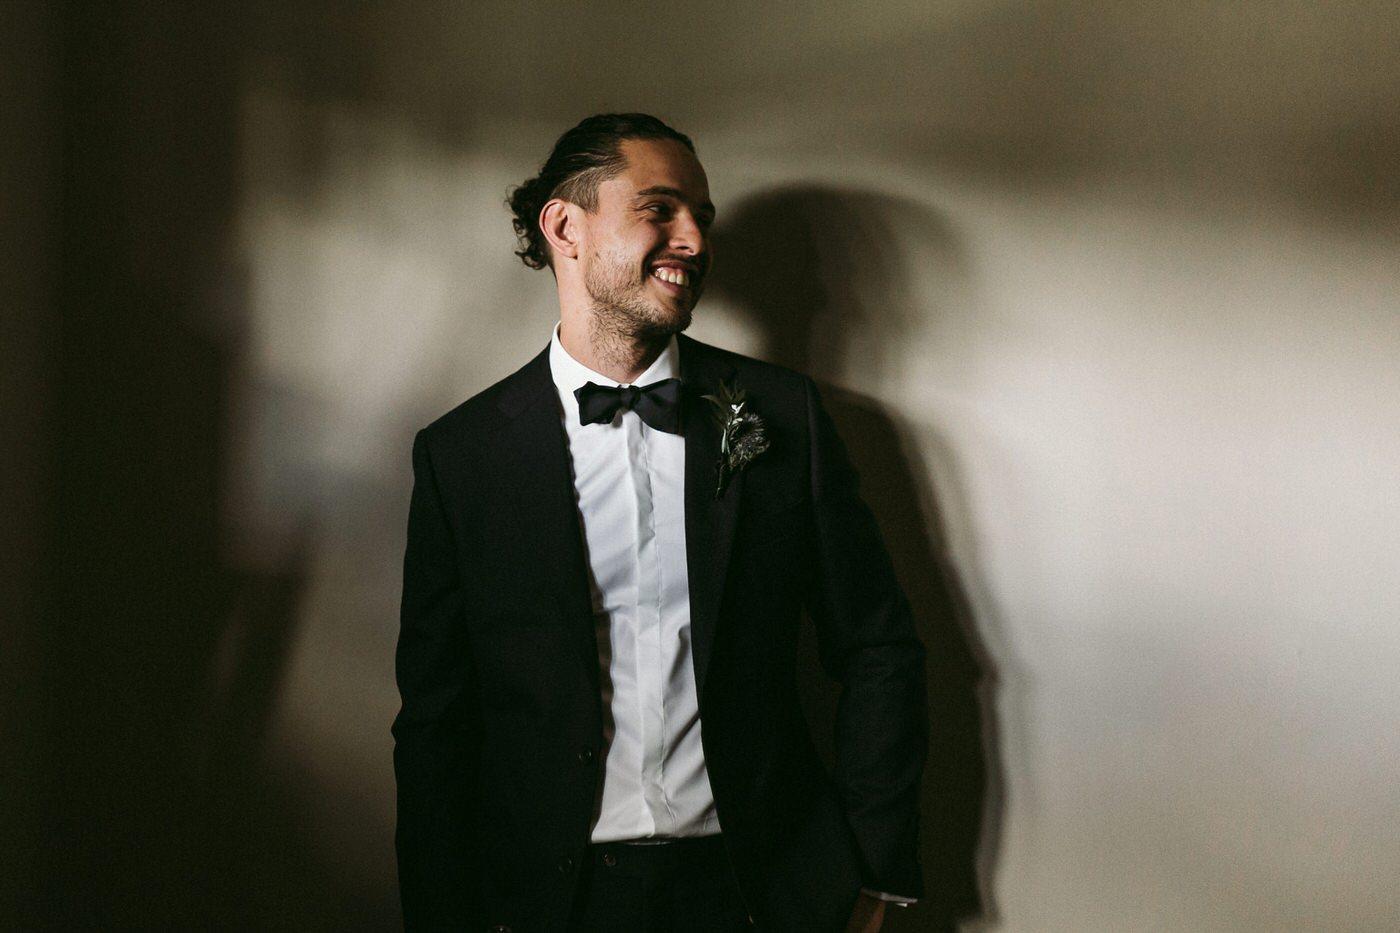 GoldandGrit_KimMatt_Panama-Dining-Room-Fitzroy-Collingwood-Relaxed-Fun-Candid-Wedding-Photography_20.jpg